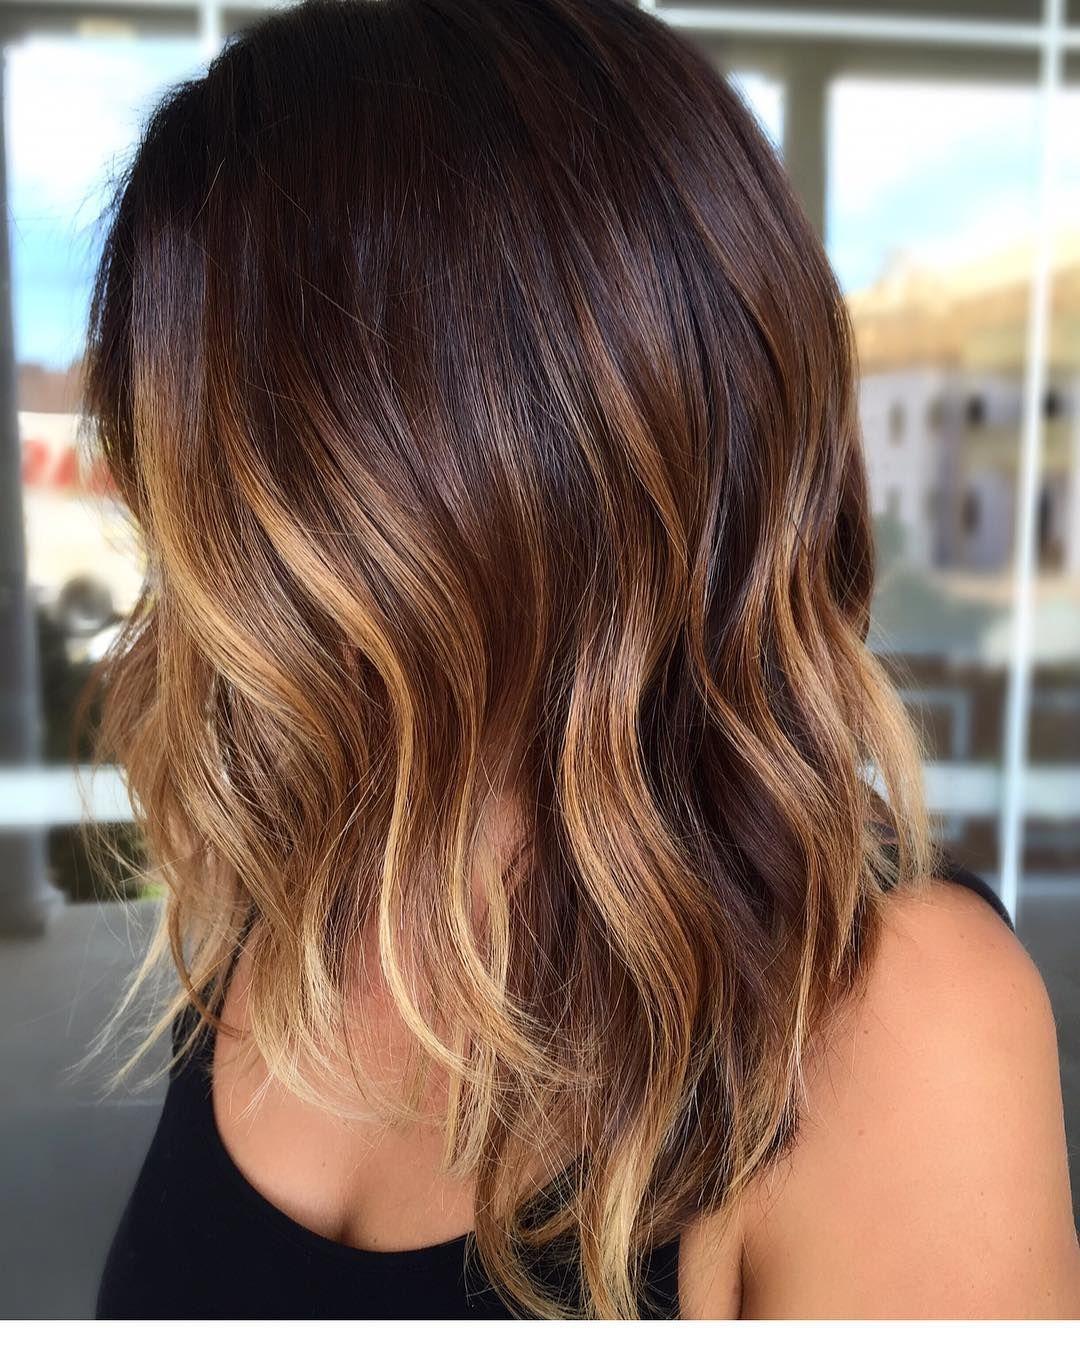 Cool 65 phenomenal dark hair with highlights flattering streaks cool 65 phenomenal dark hair with highlights flattering streaks for your dark mane check more pmusecretfo Images